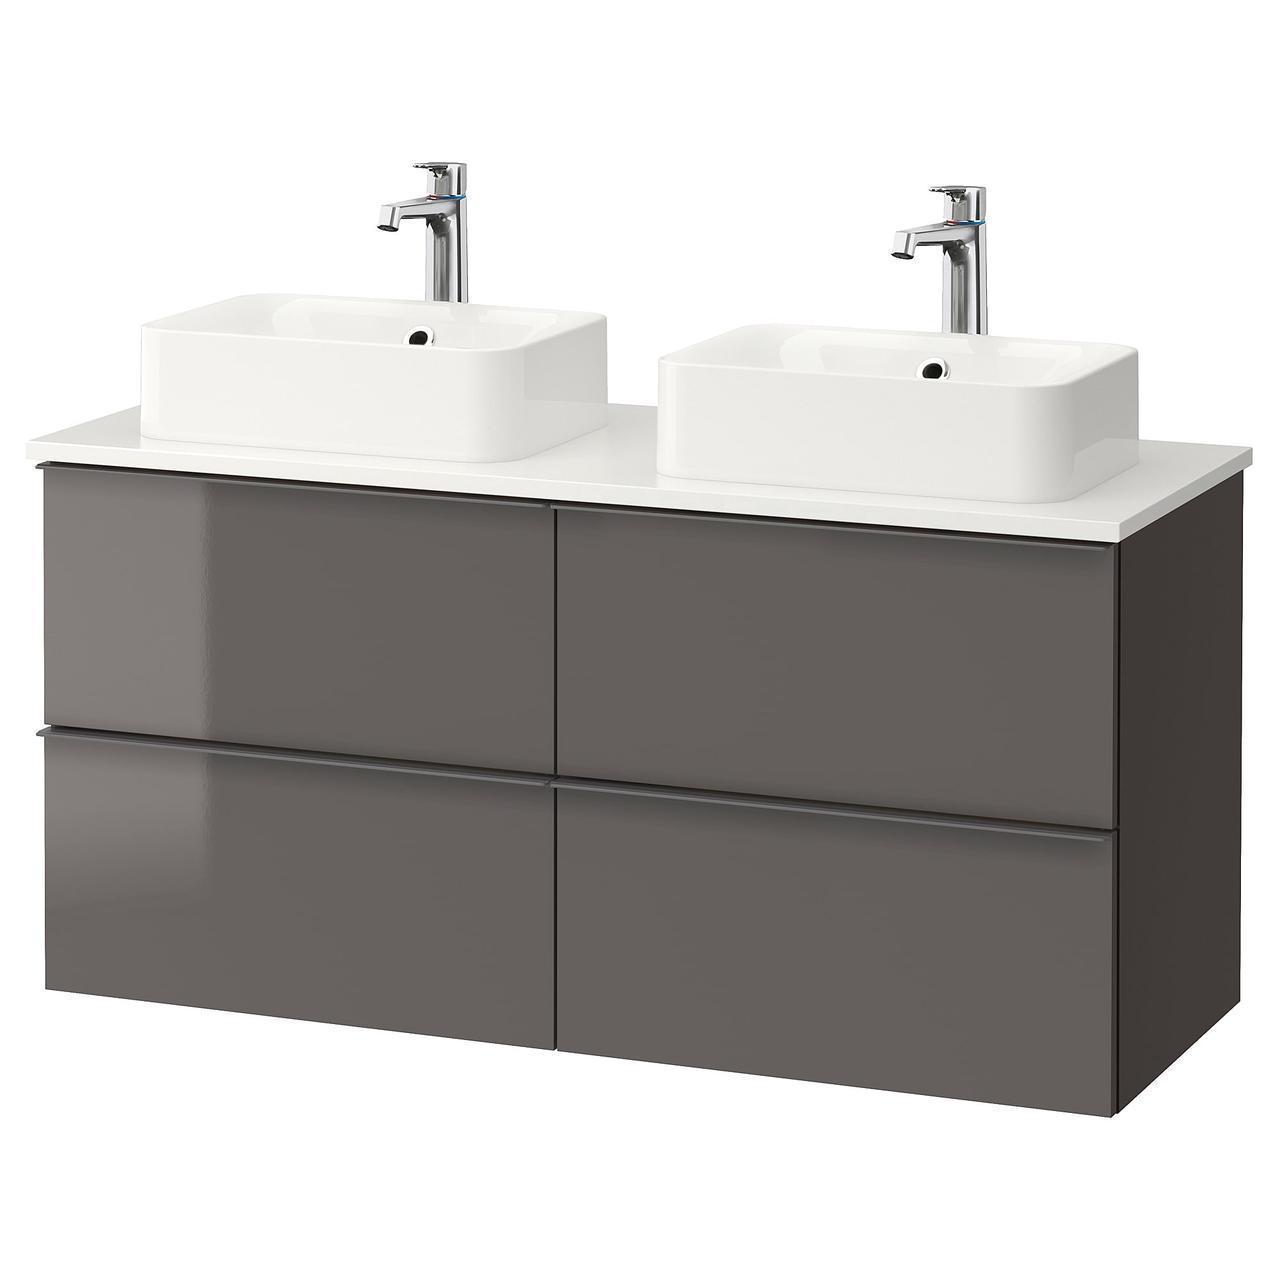 IKEA GODMORGON/TOLKEN/HORVIK Шкаф под умывальник с раковиной 45x32, глянцевый серый, белый  (292.088.58)